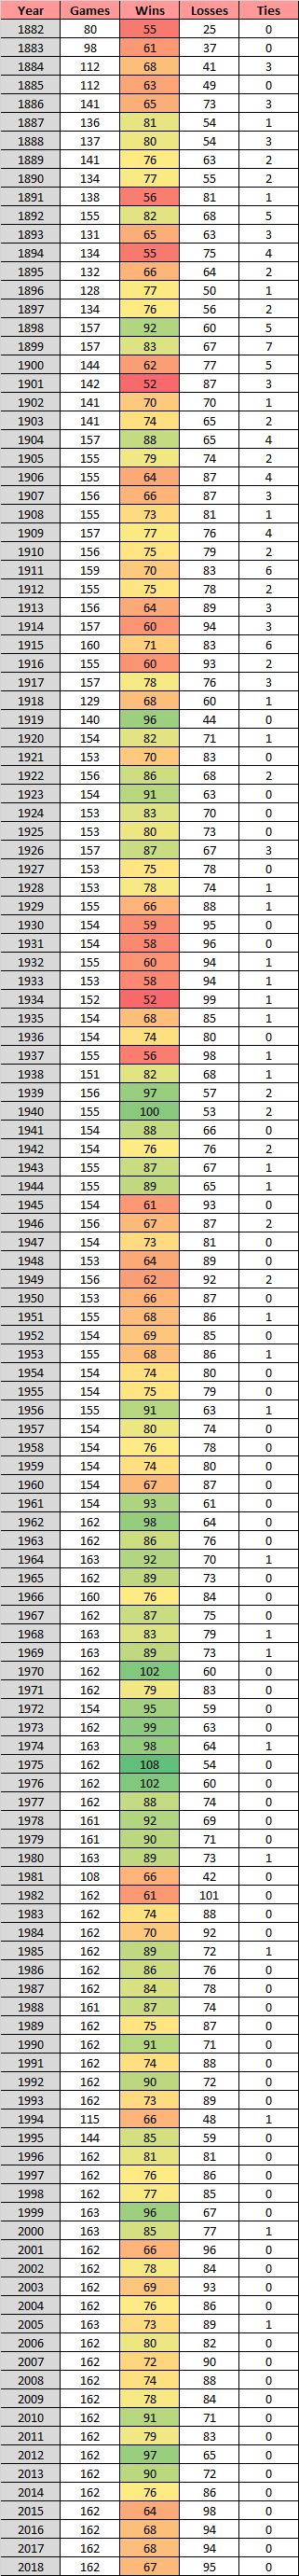 Cincinnati Reds record by year